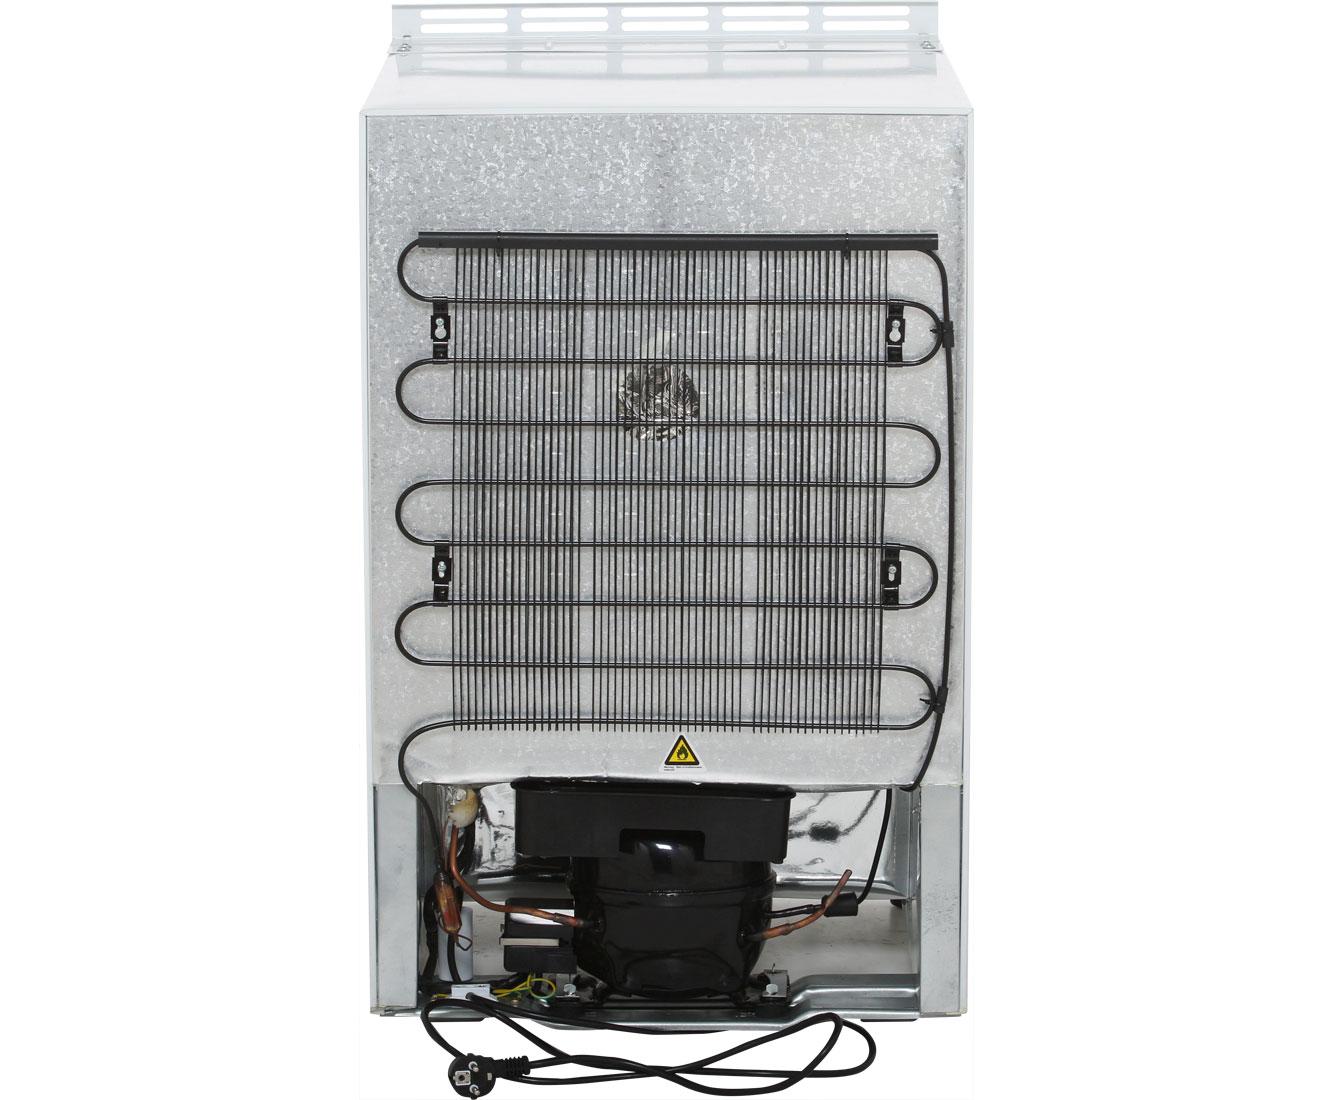 Gorenje Kühlschrank Unterbaufähig : Gorenje ru 5004 a kühlschrank unterbau 50cm weiss neu ebay